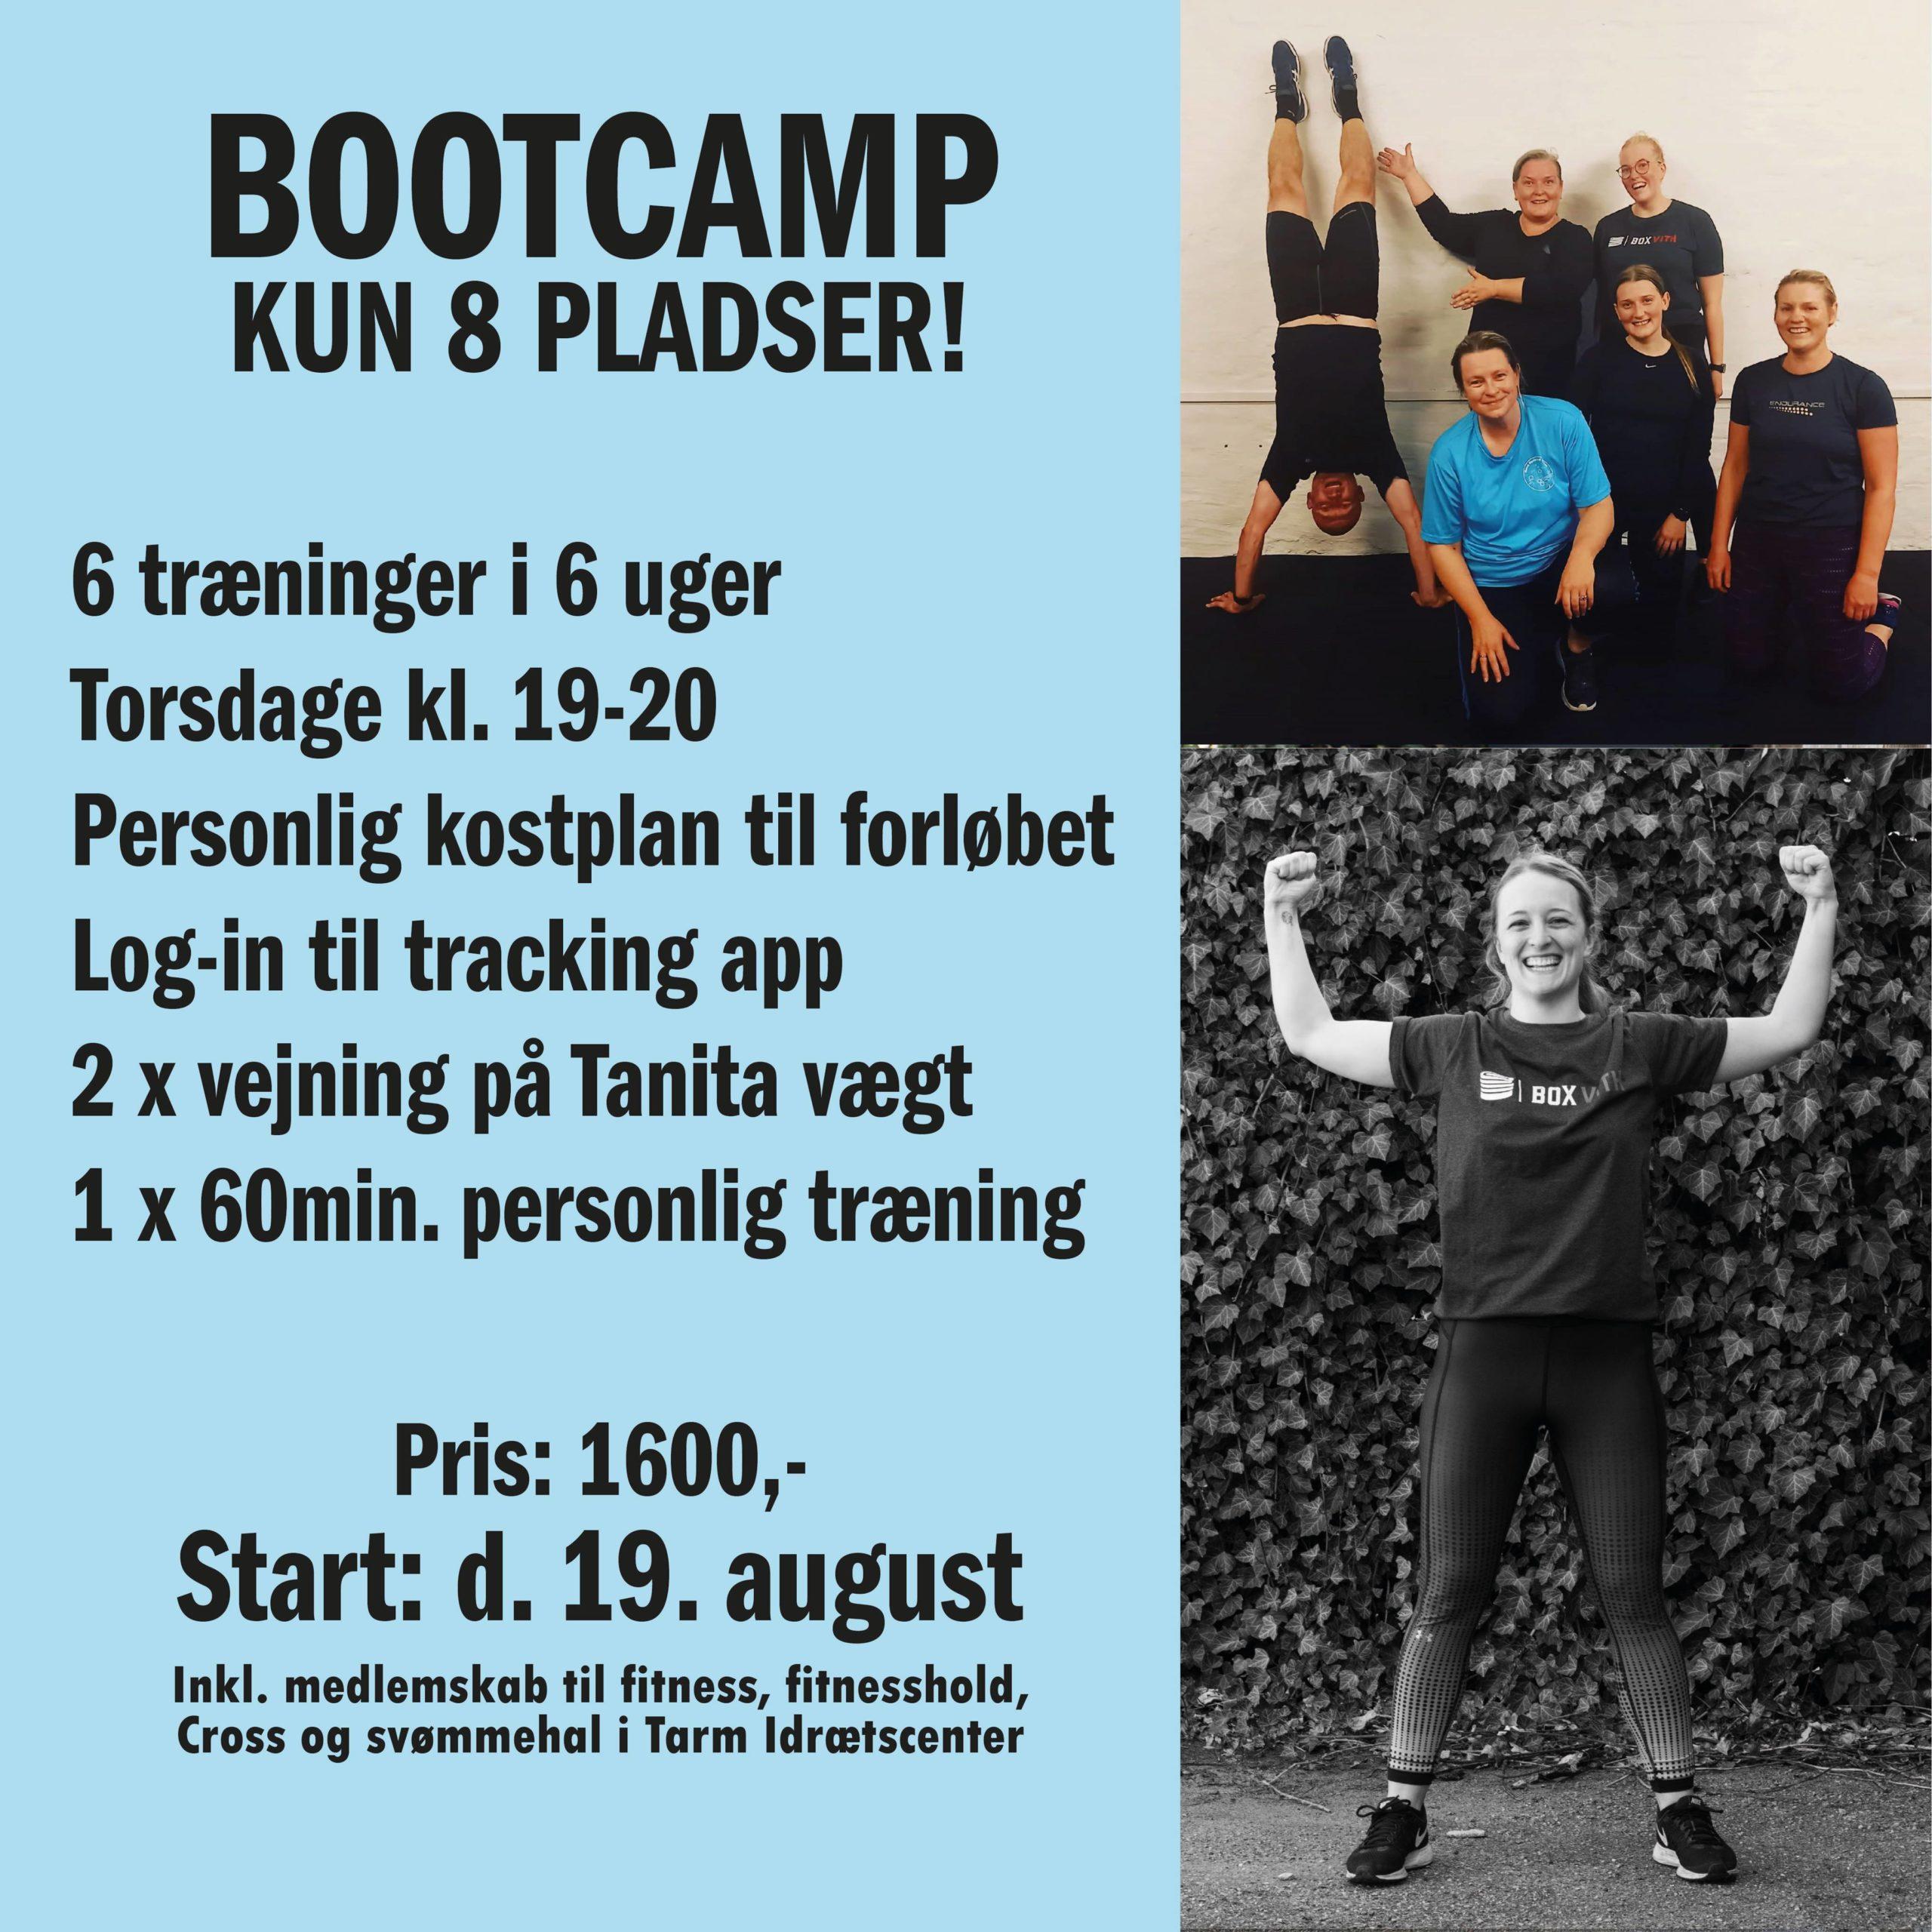 Bootcamp - Freja